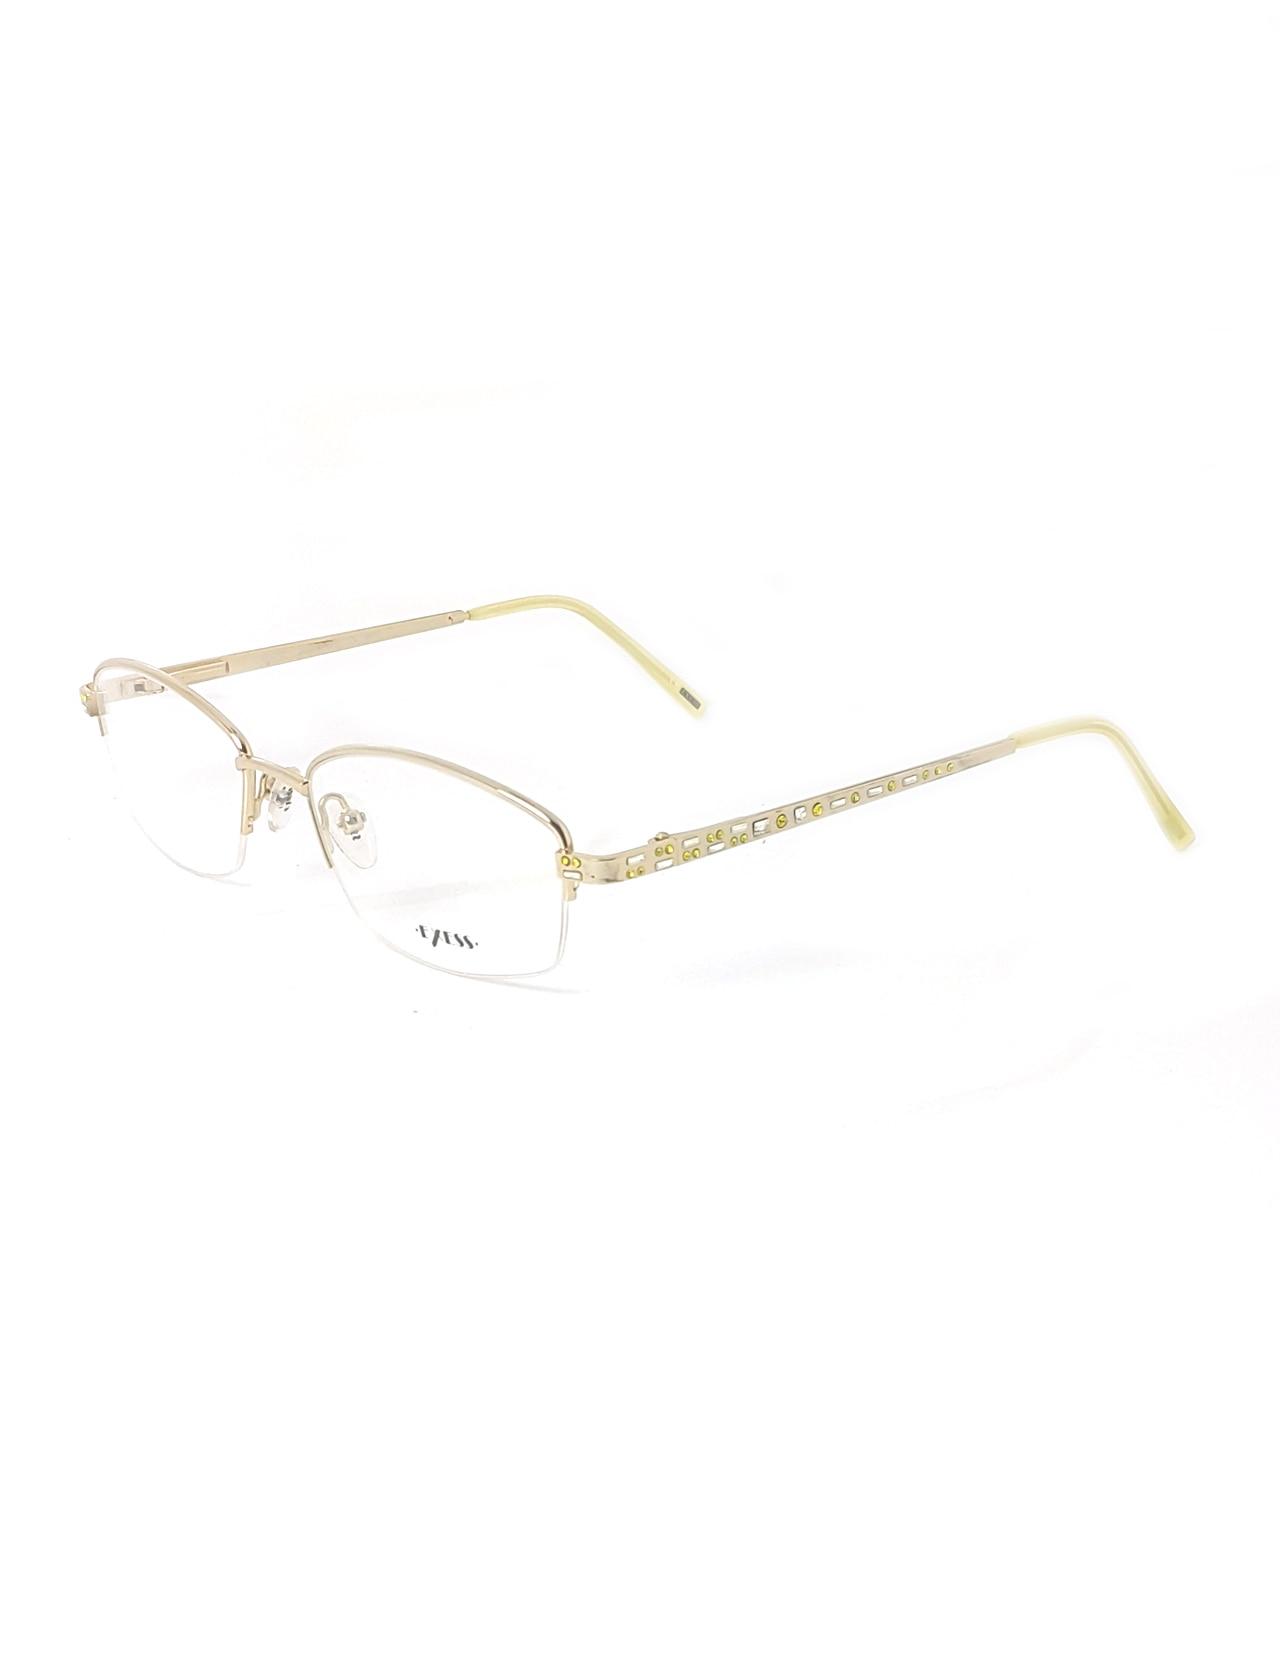 Markamilla Women Reading Glasses Frame Demo Glasses Eyewear Transparent High Quality WomenExess E 3253 6567 52